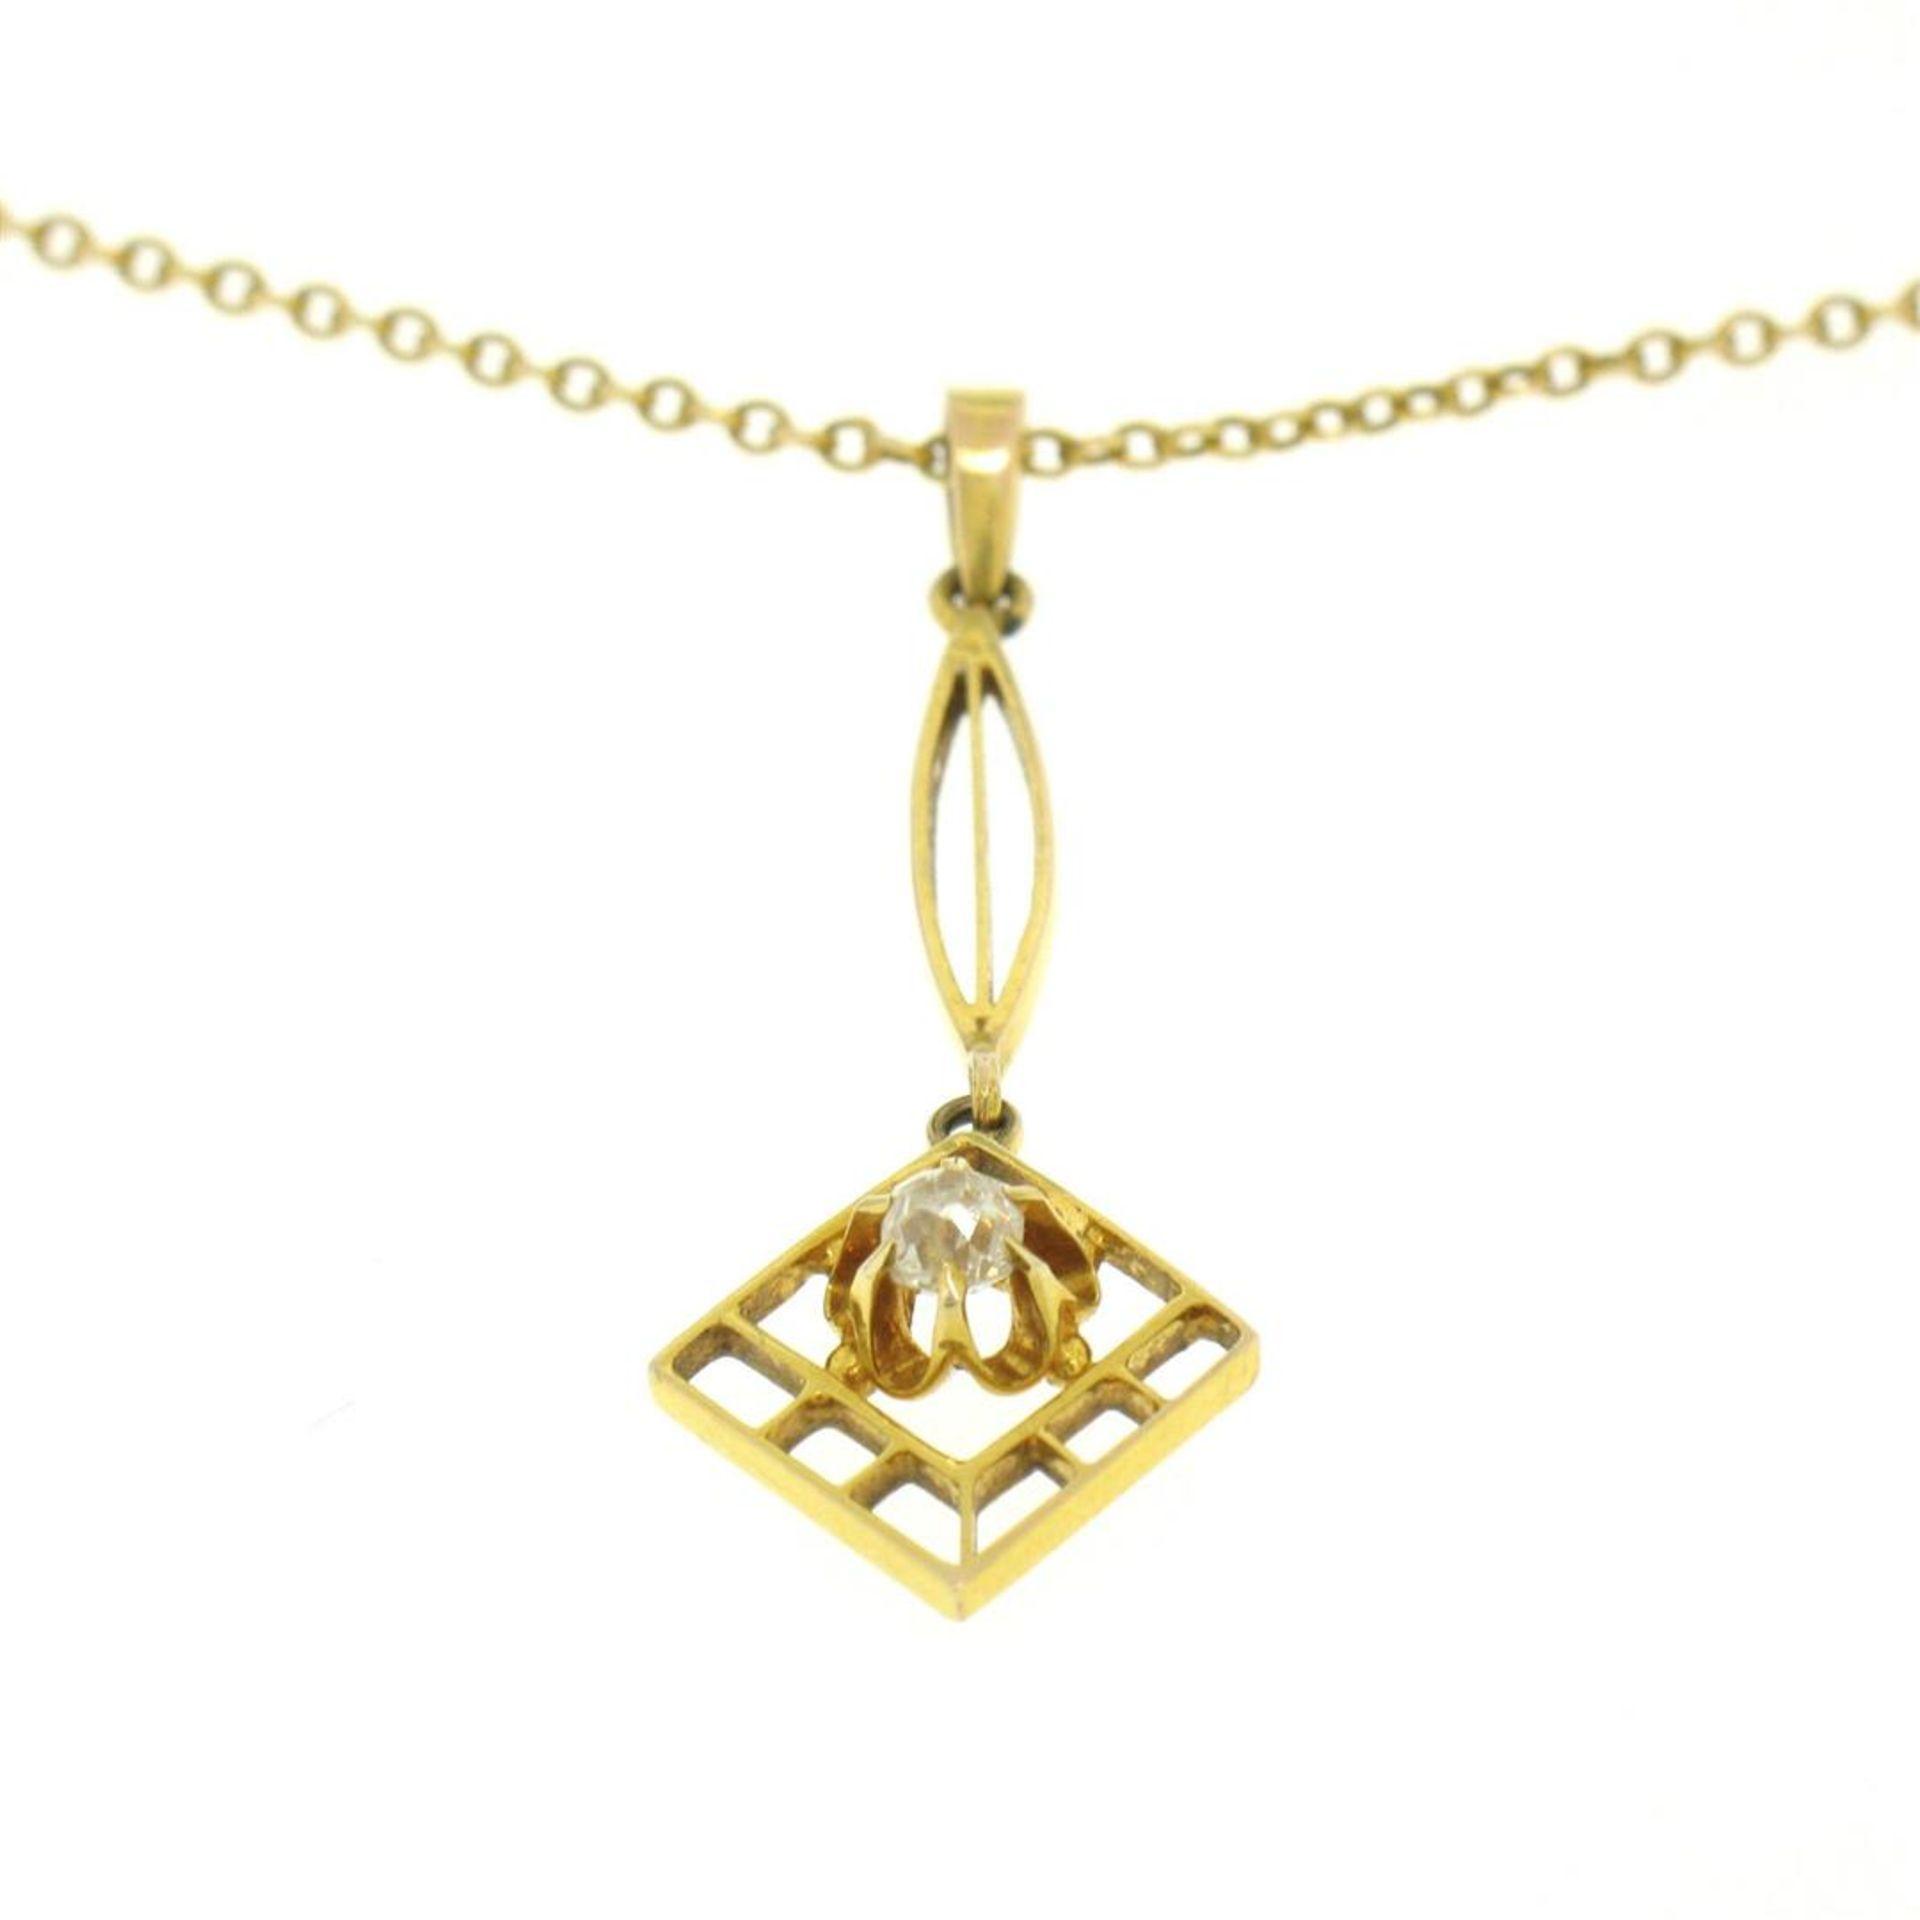 14k Gold Cushion Mine Cut Diamond Lavalier Pendant - Image 4 of 7